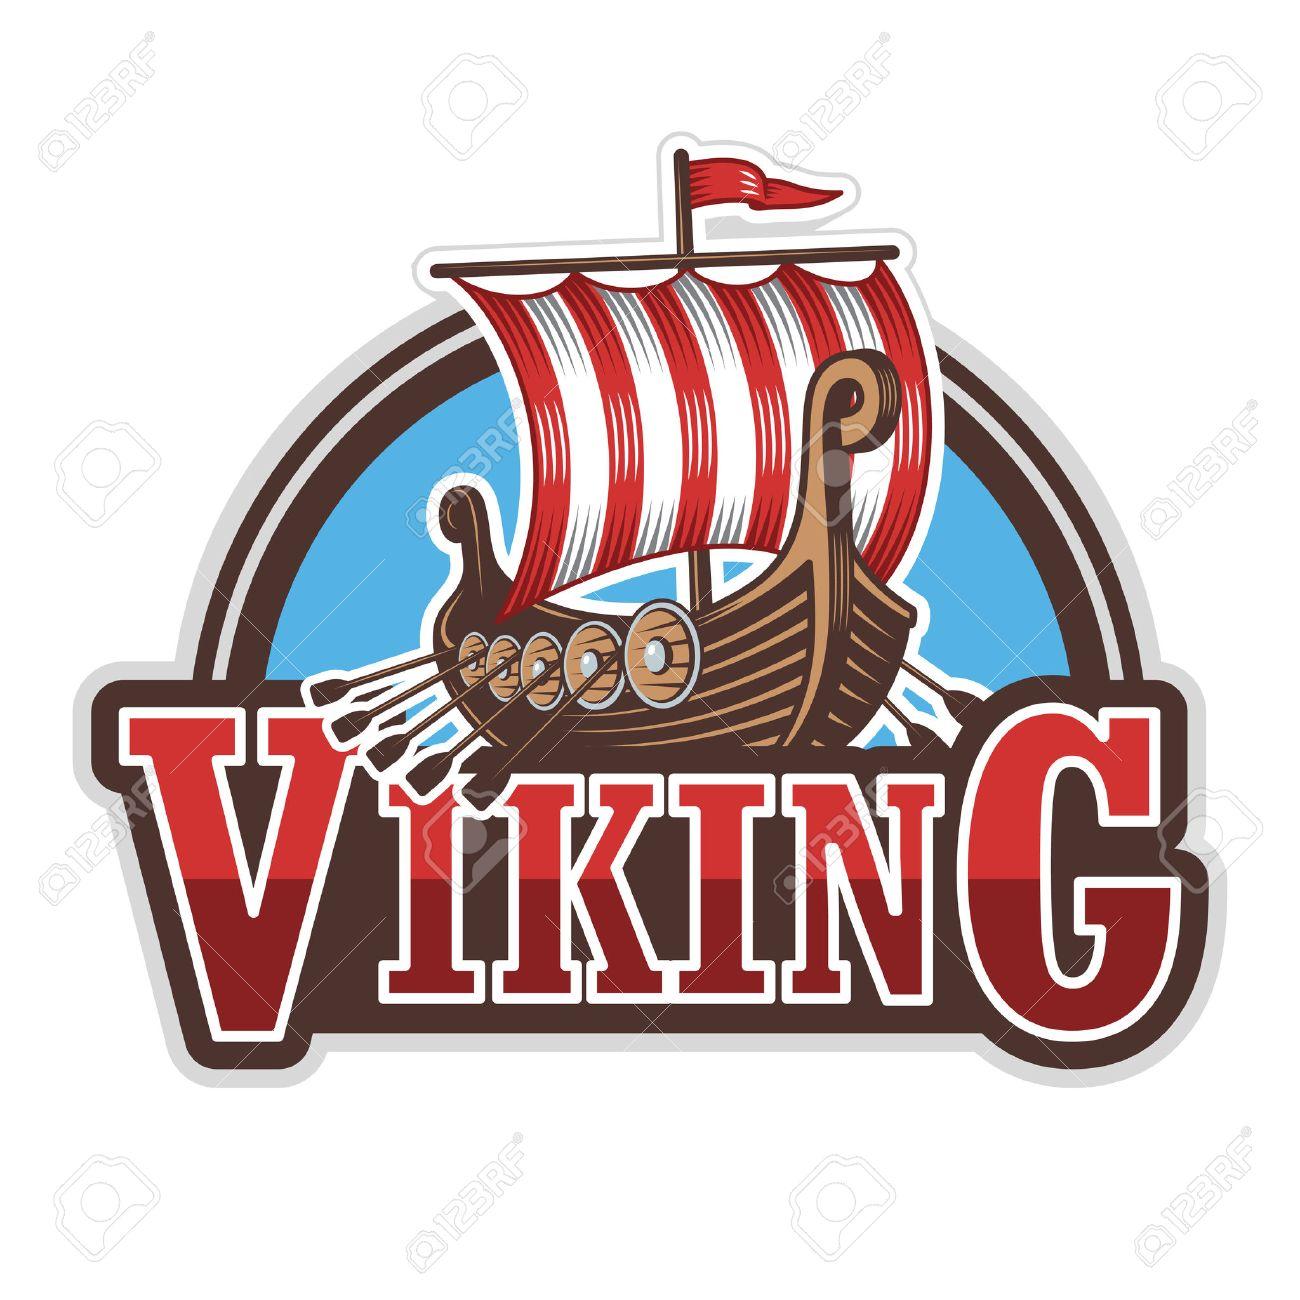 viking ship sport logo colored isolated on white background royalty rh 123rf com Ancient Viking Ships Ancient Viking Ships